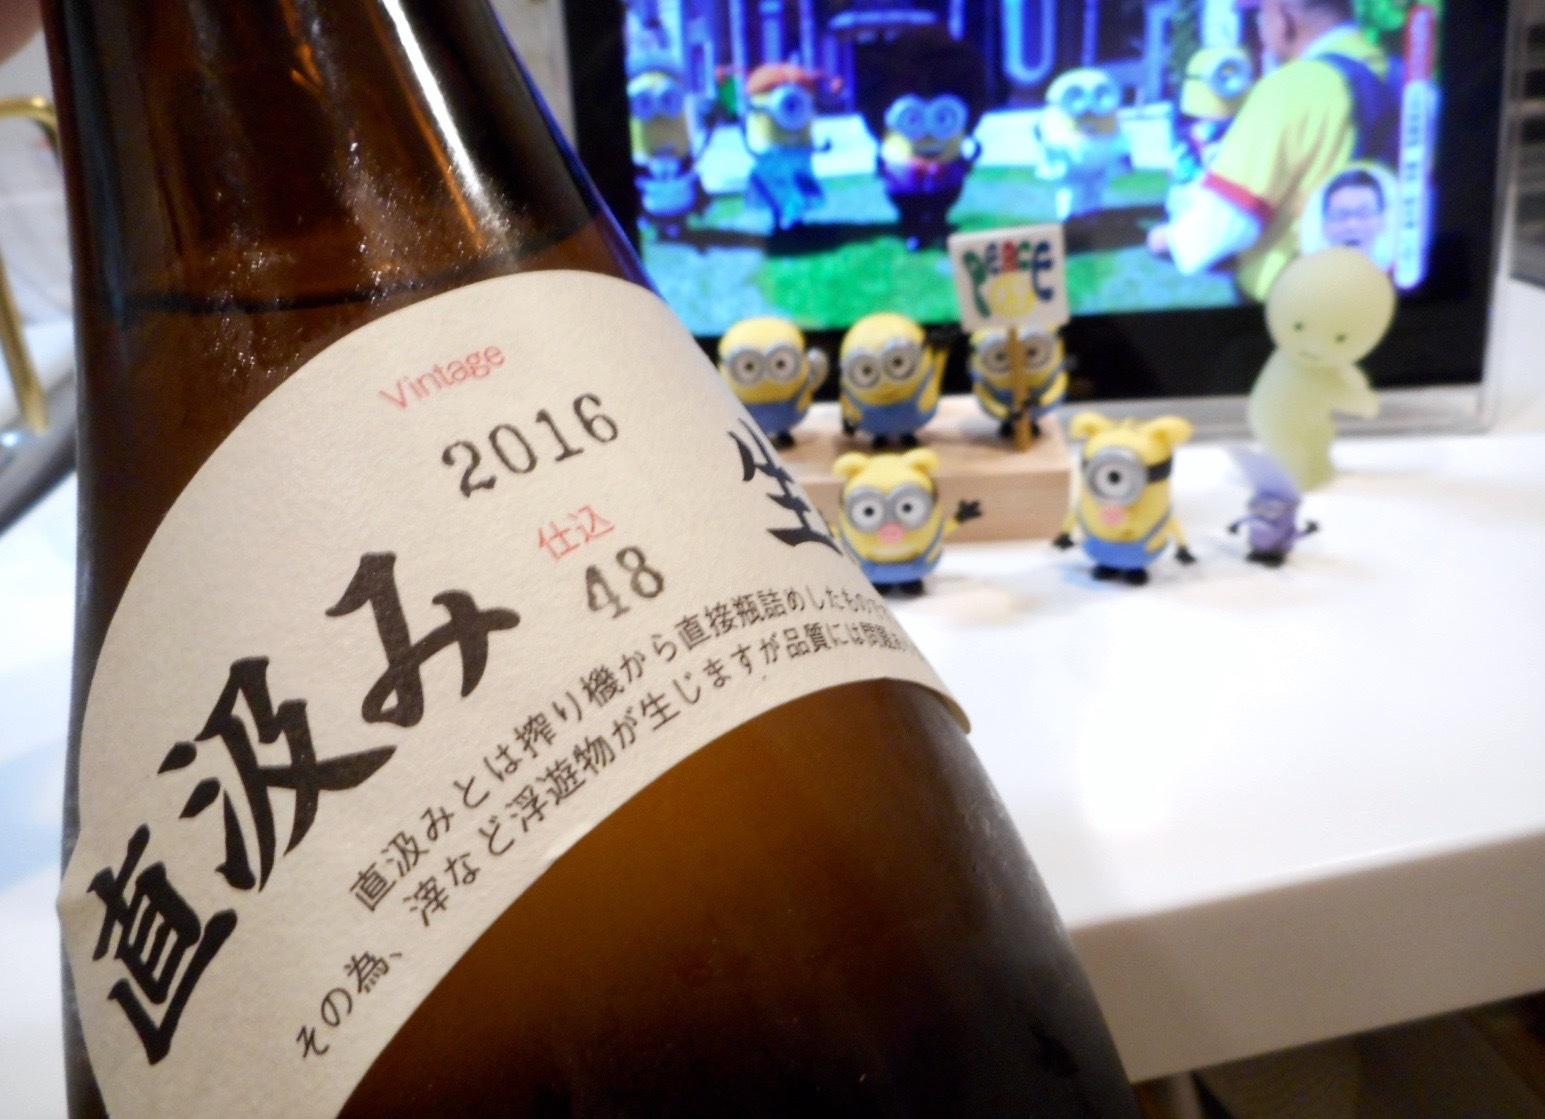 kurosawa_jikagumi_yellow28by4.jpg